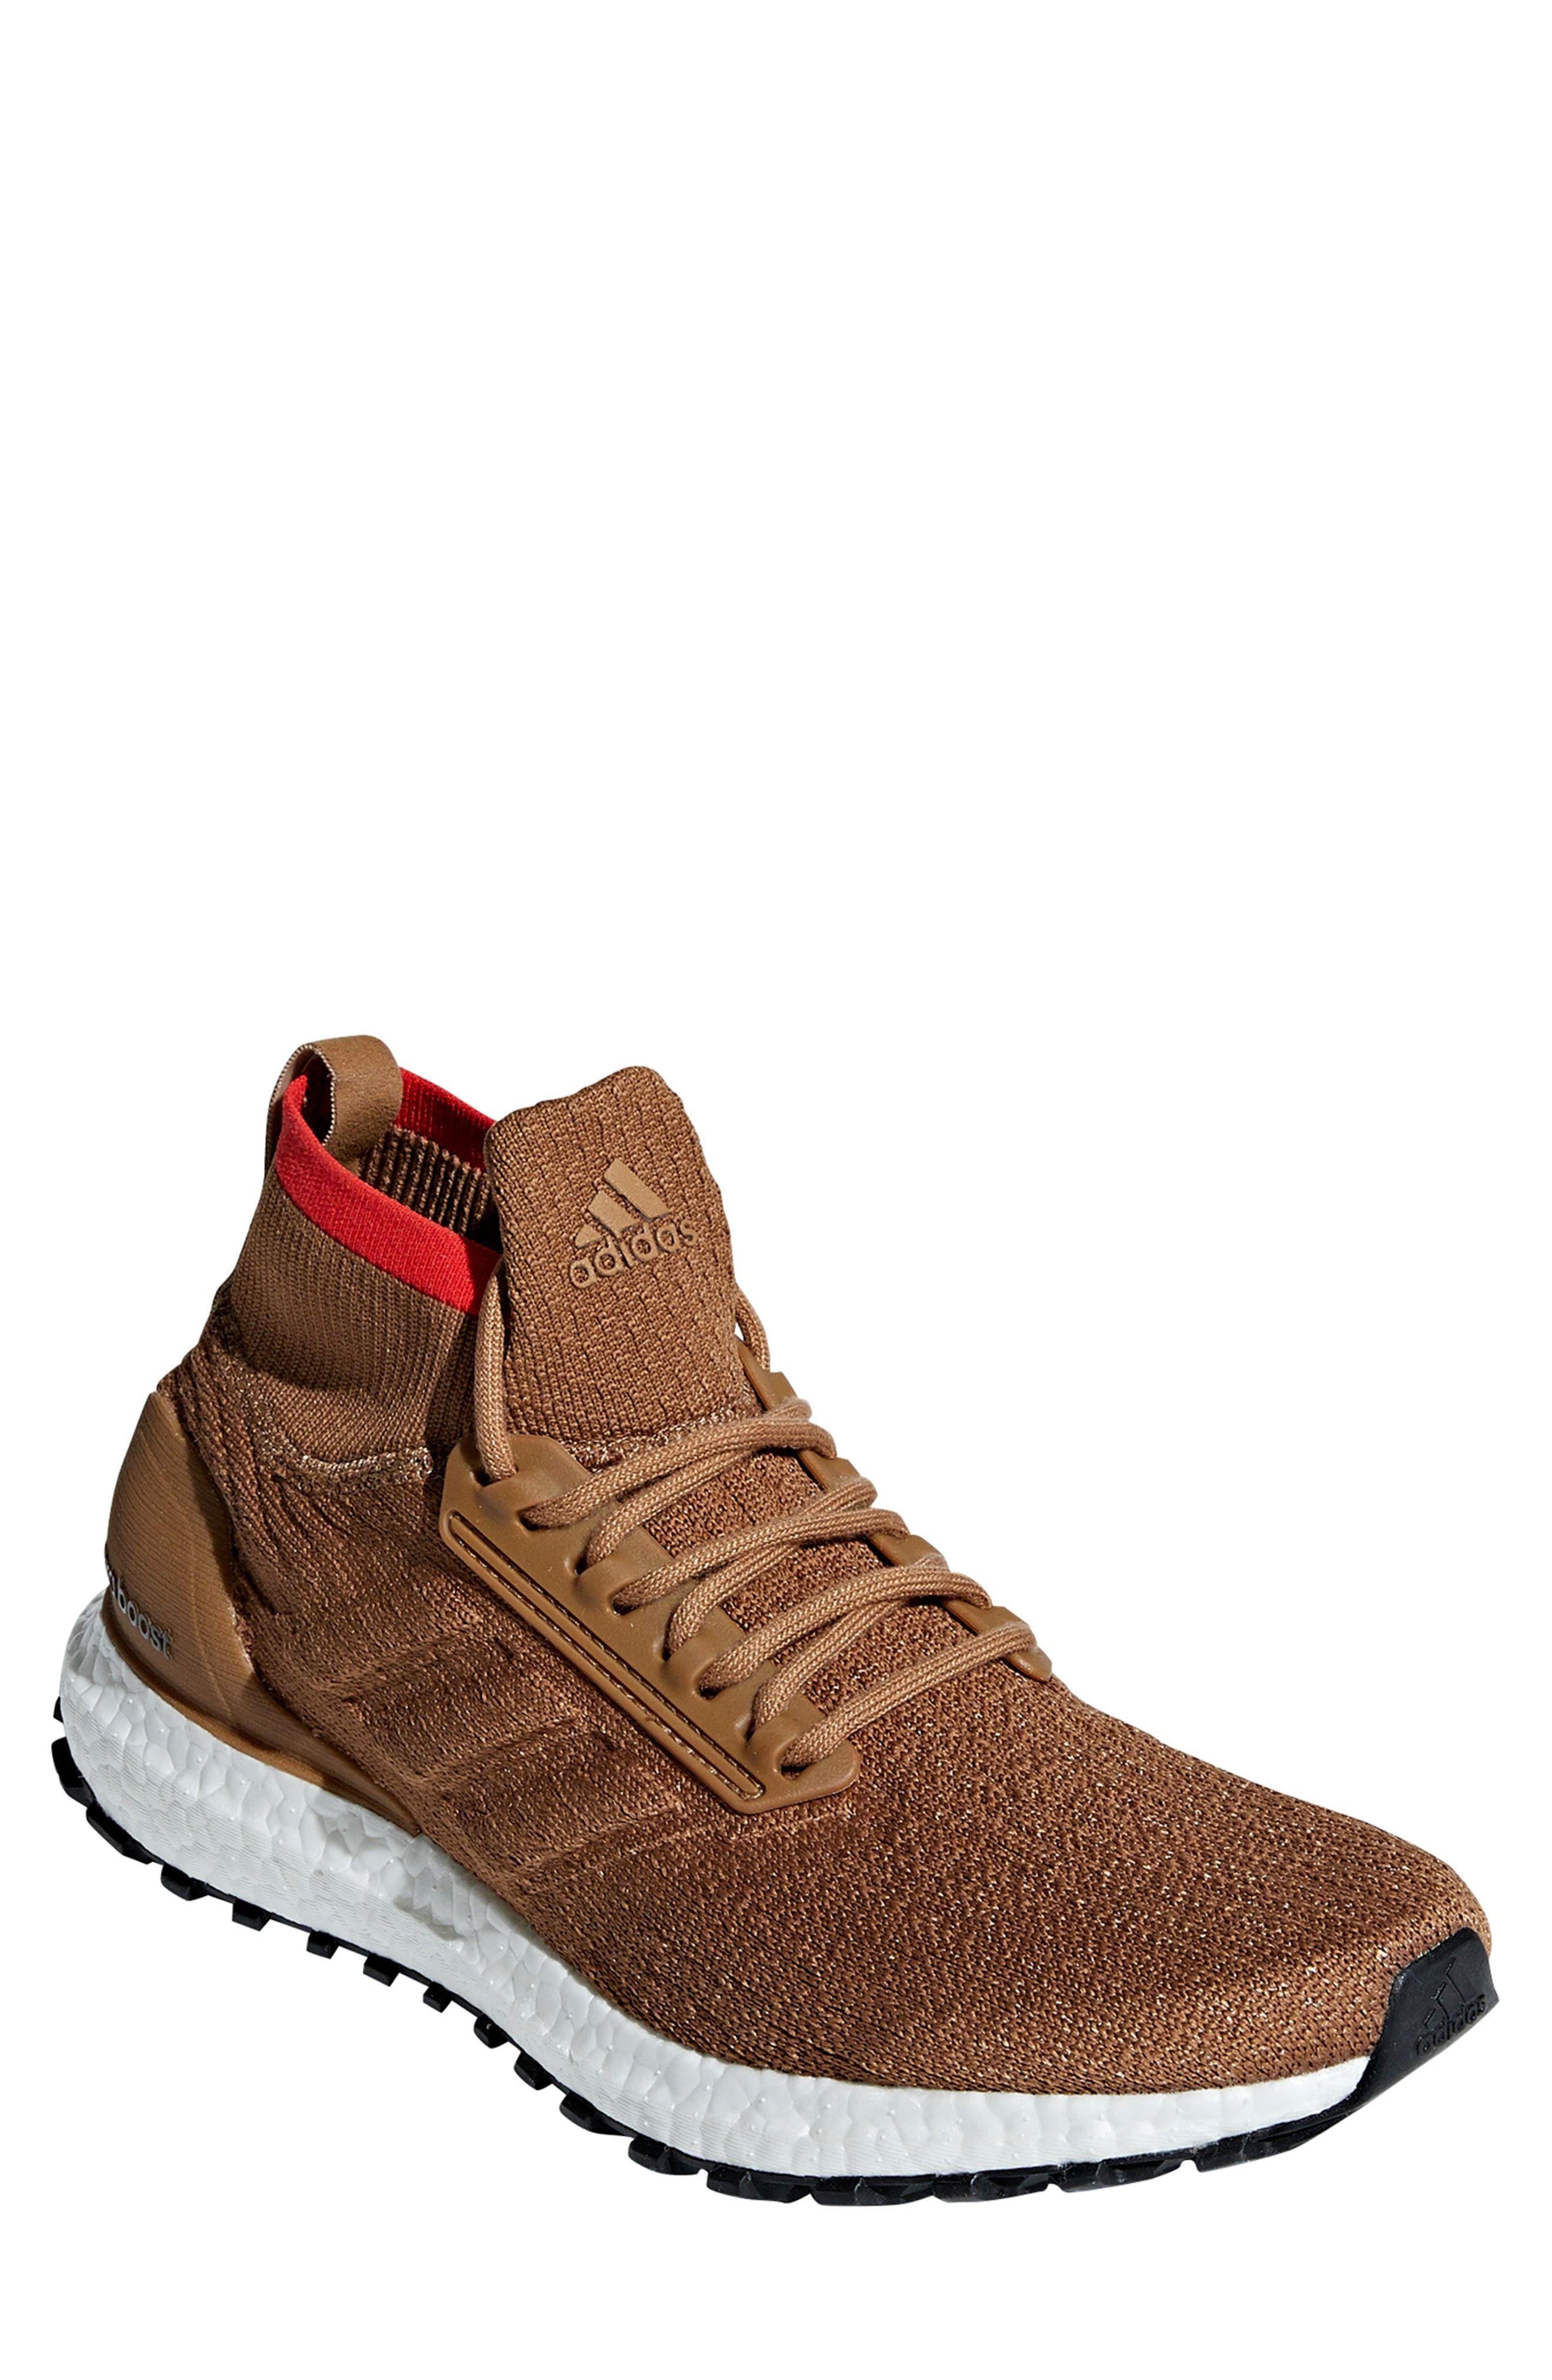 41e56de089843 ADIDAS ORIGINALS ULTRABOOST ALL TERRAIN WATER RESISTANT RUNNING SHOE.   adidasoriginals  shoes